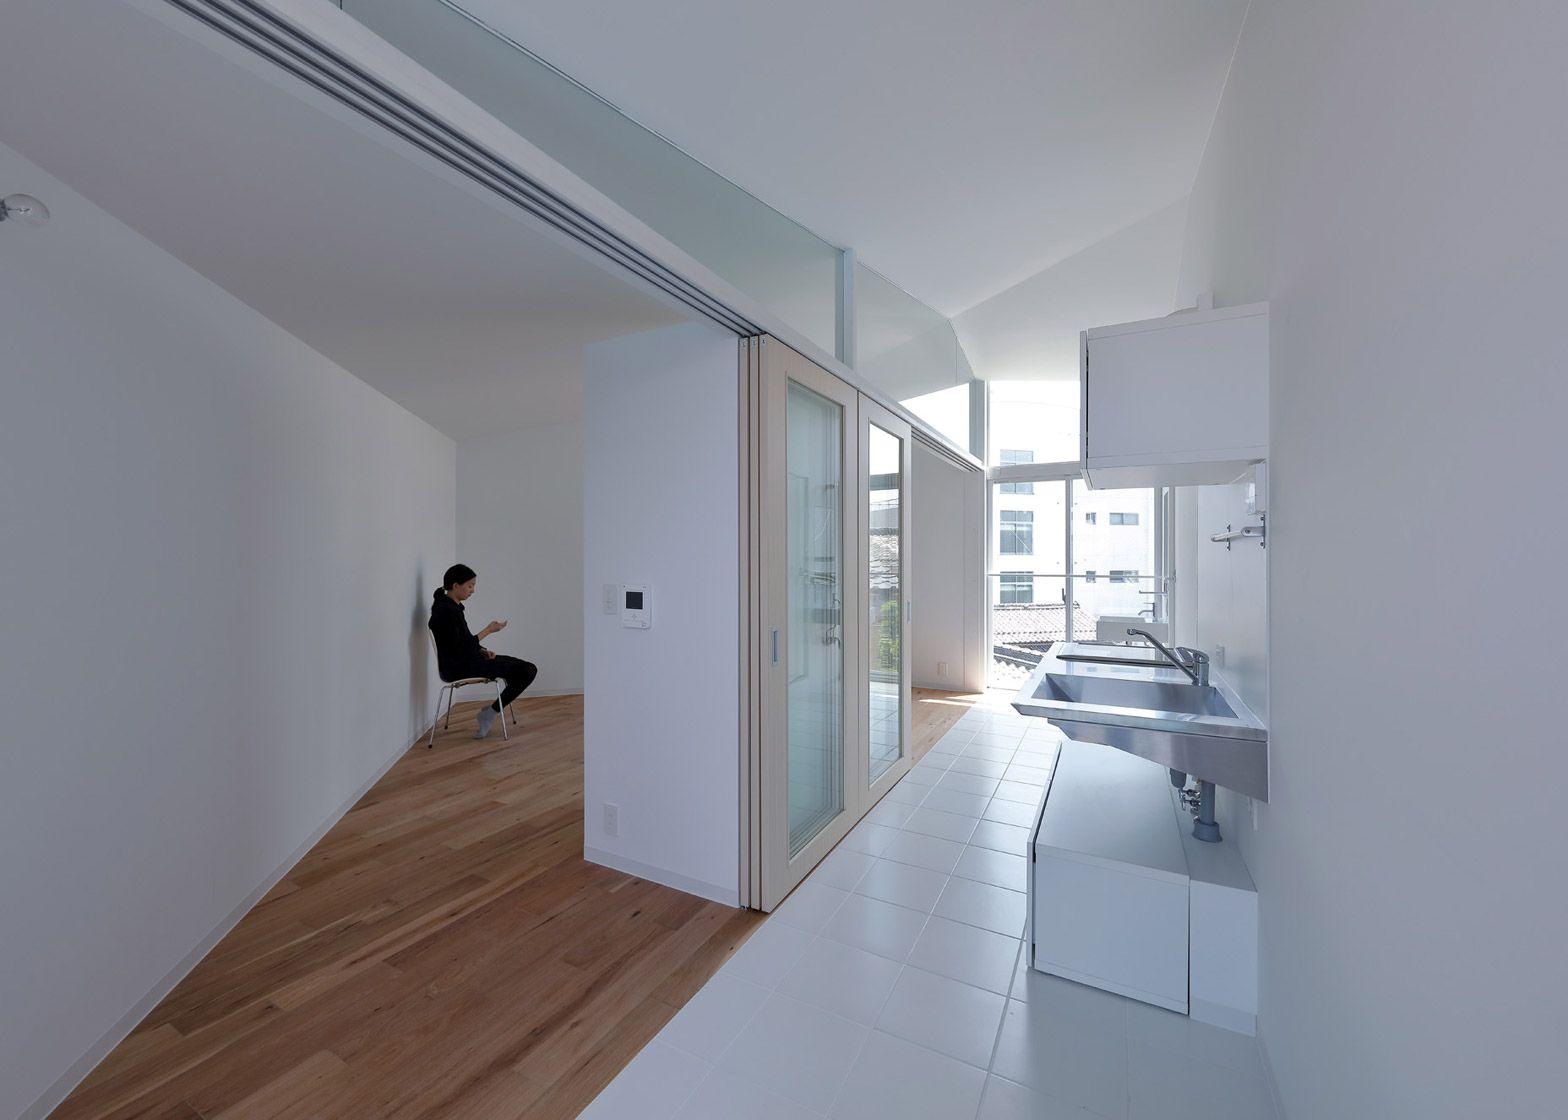 Studio Apartments, Hikone  Alphaville  VENTILATION: Each